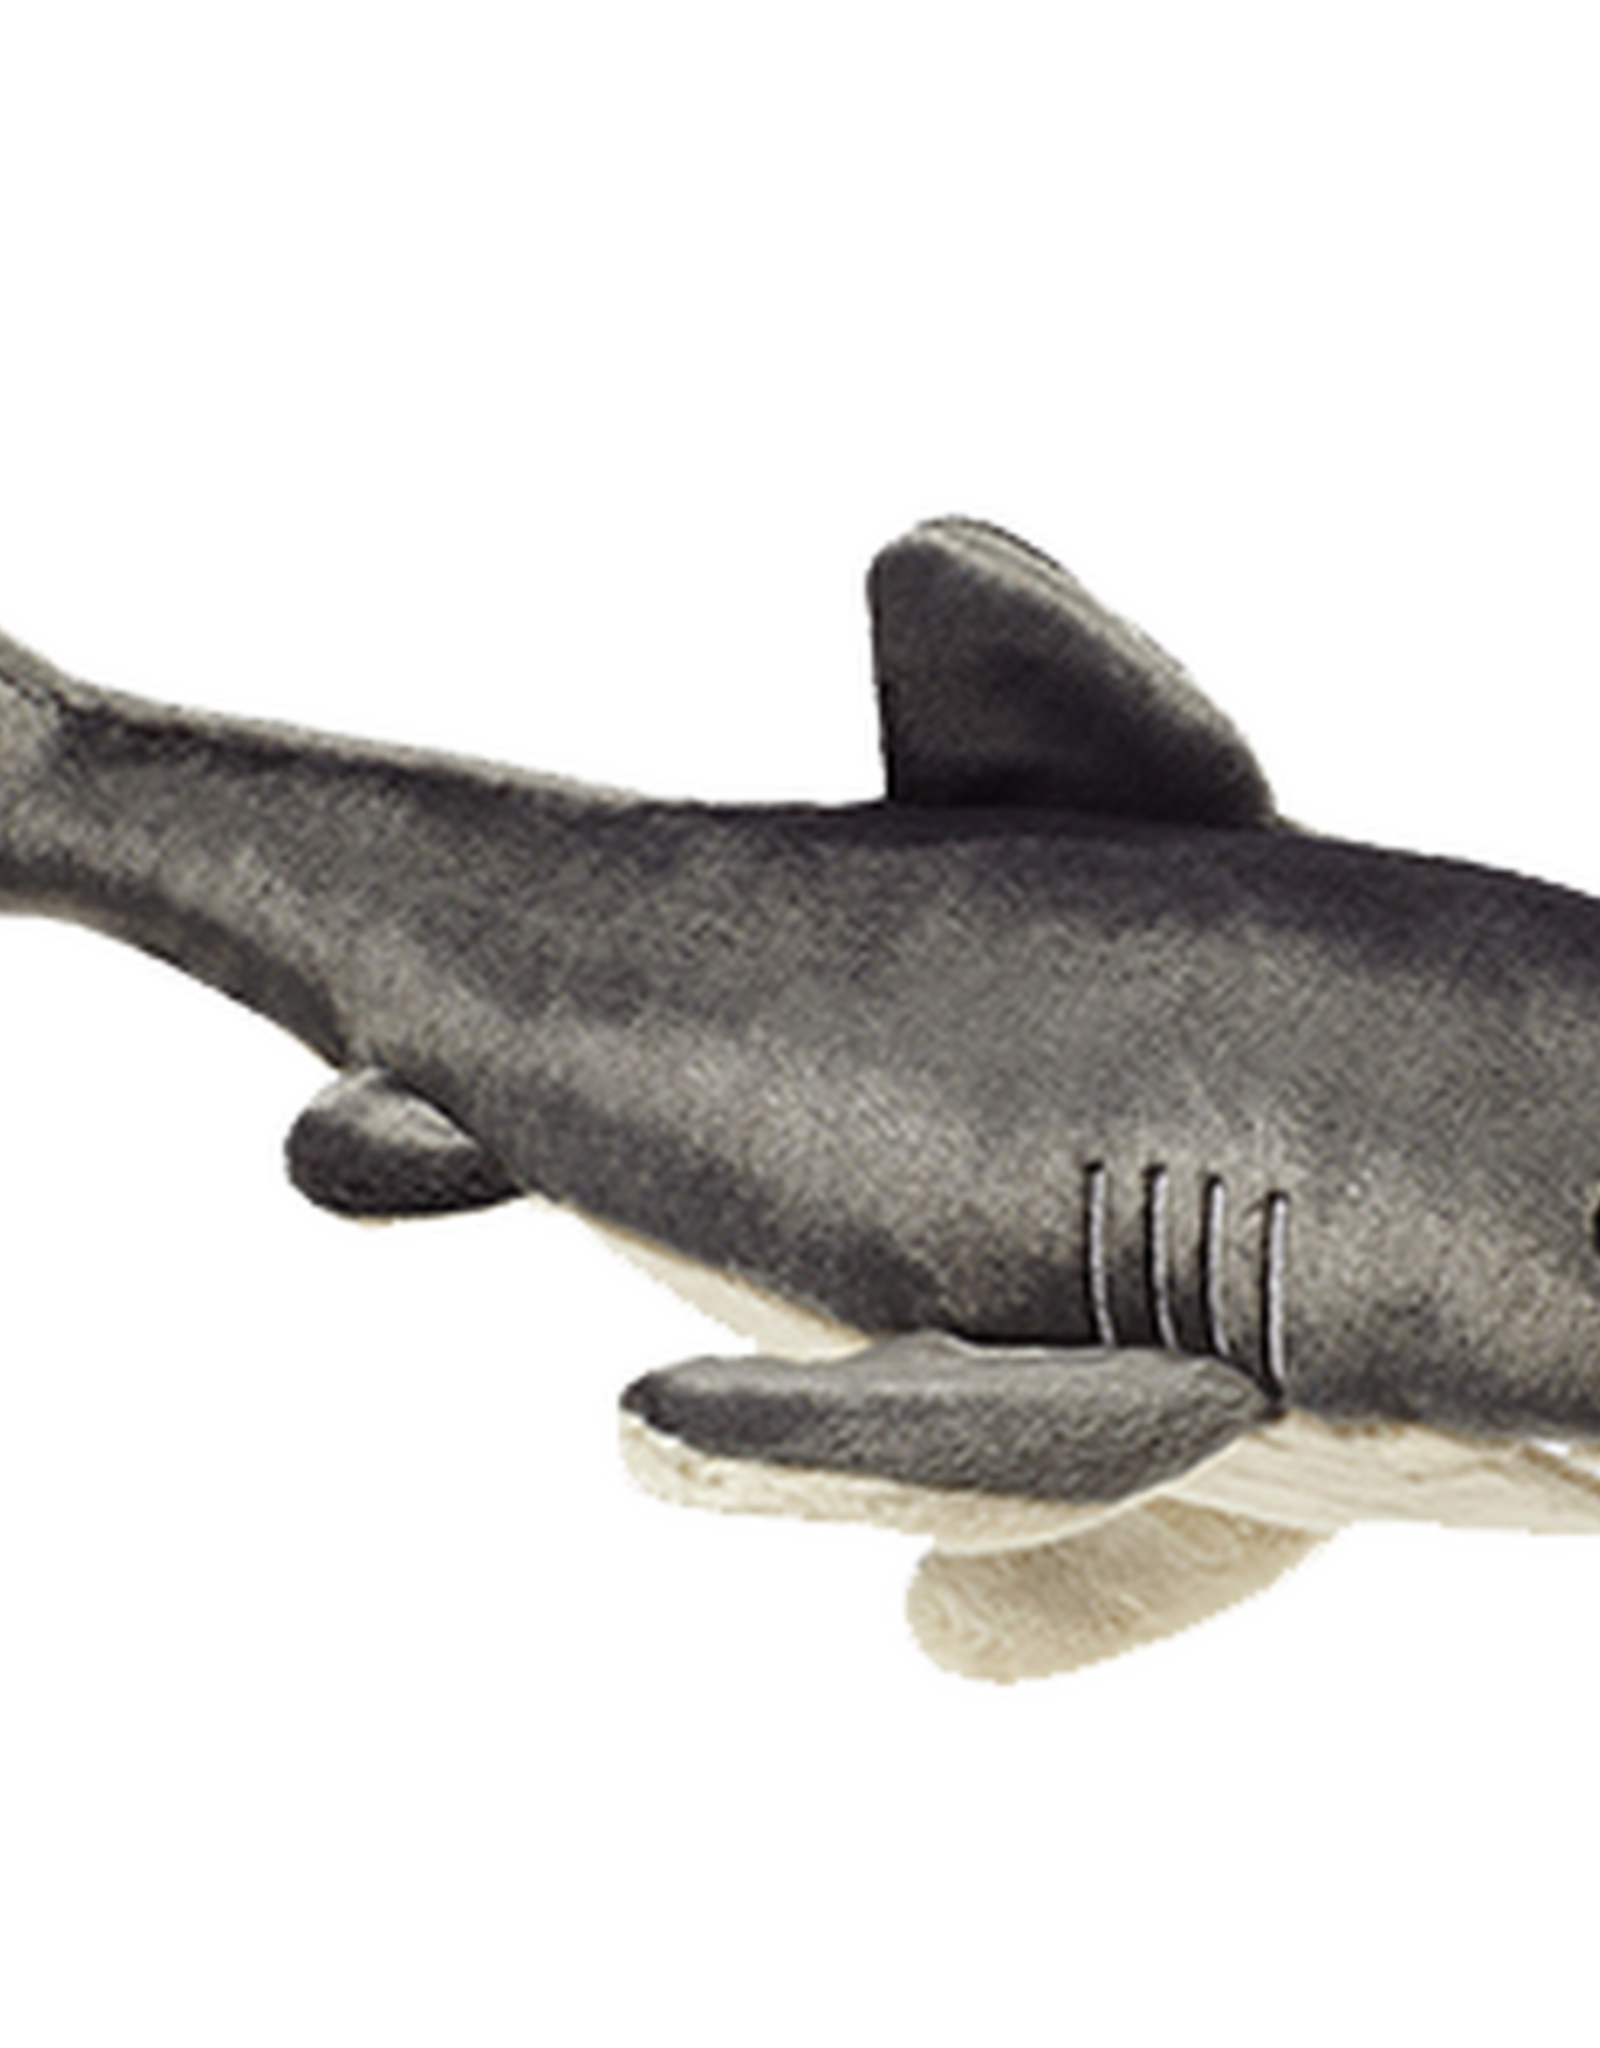 Fluff & Tuff Mac Shark